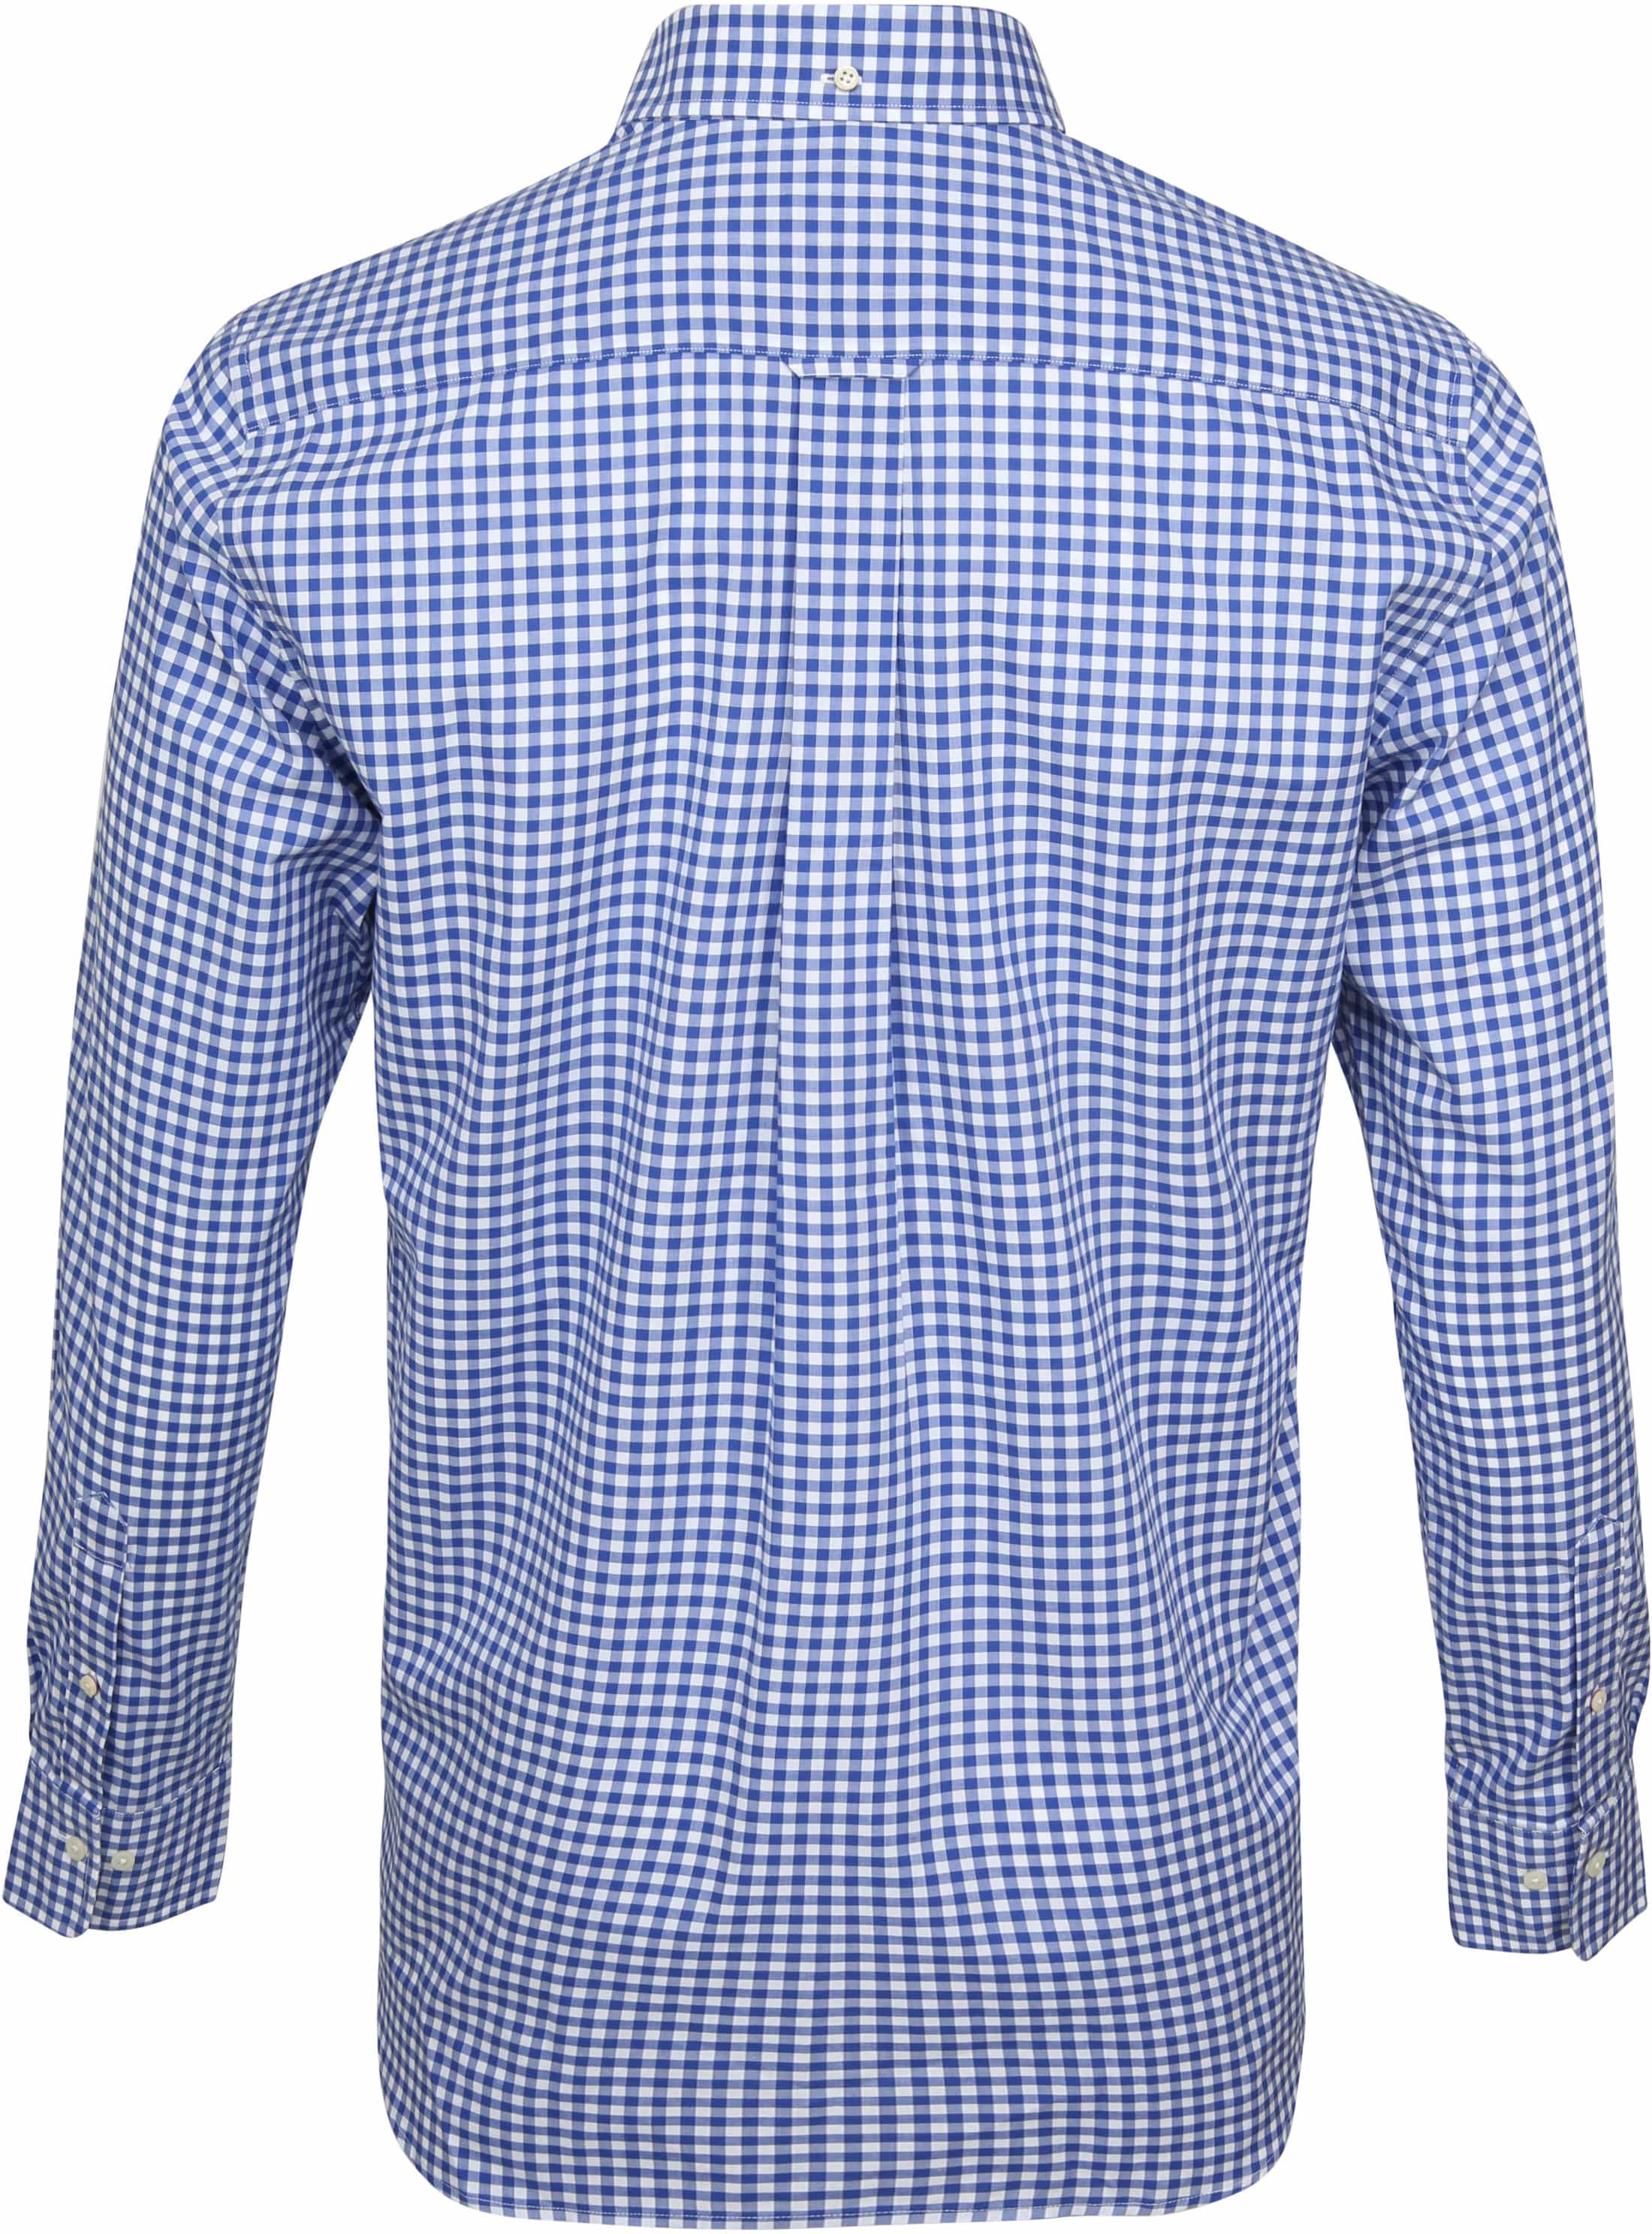 Gant Gingham Shirt Blue Check foto 3